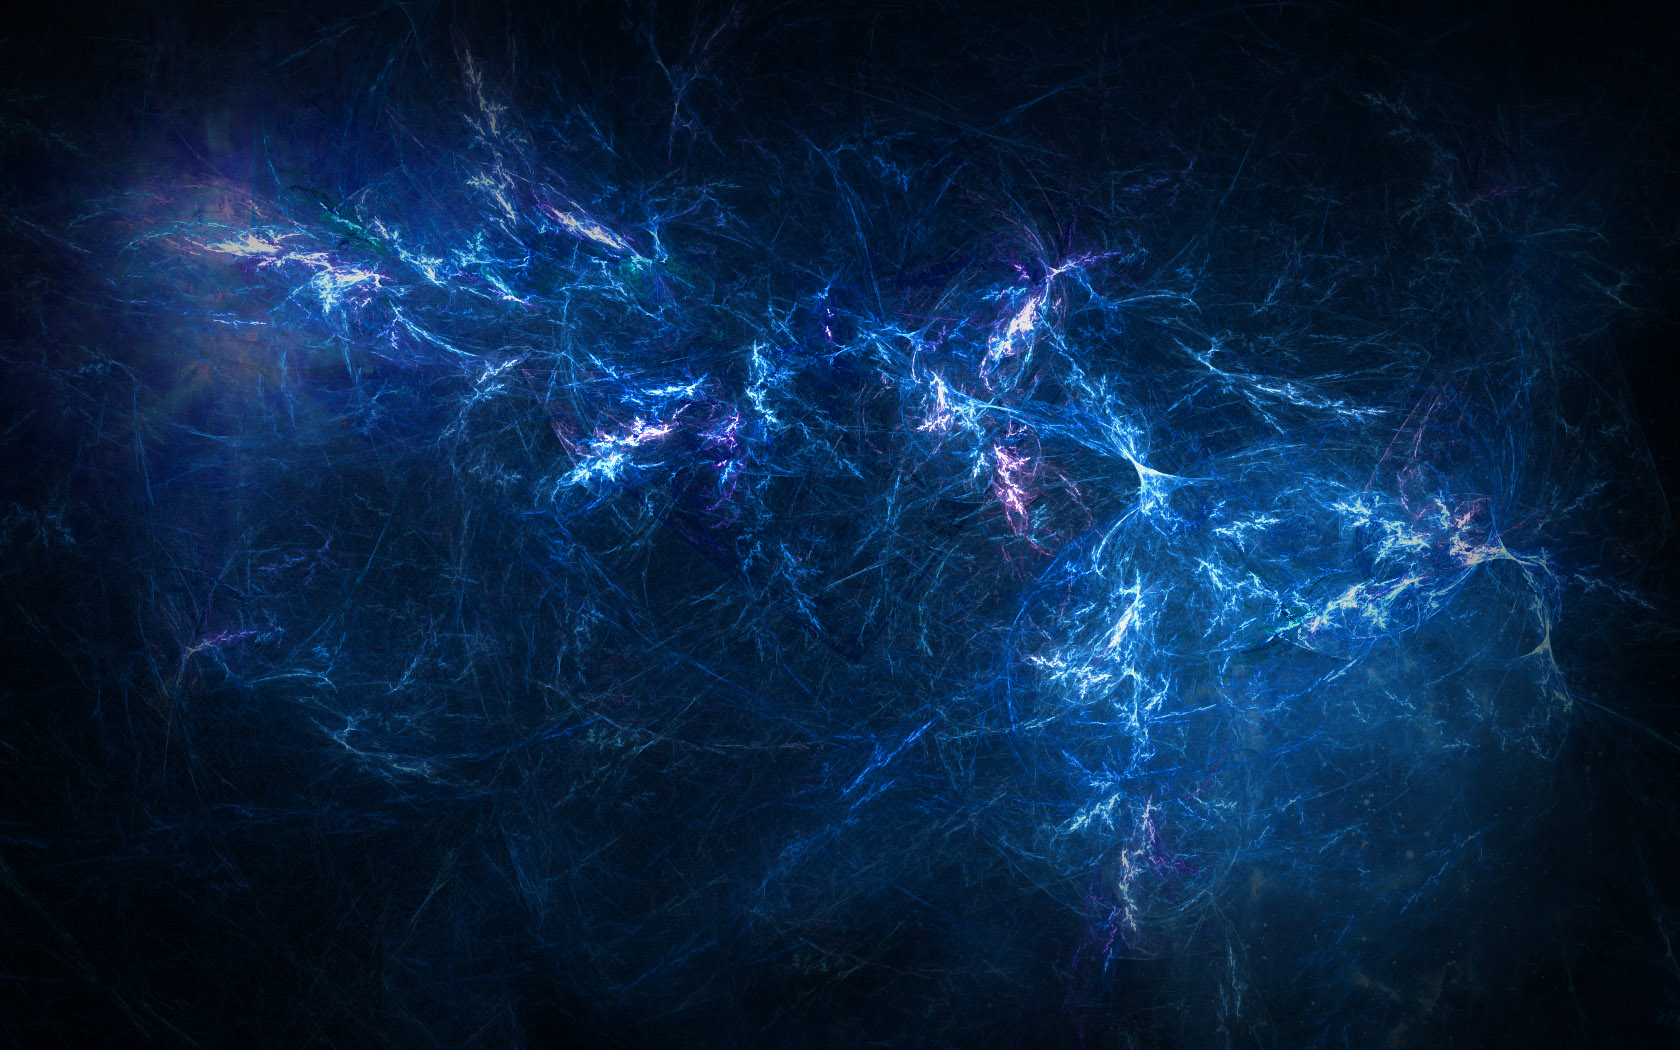 Blue Lightning Dragon Wallpaper HD Wallpaper Area HD Wallpapers 1680x1050